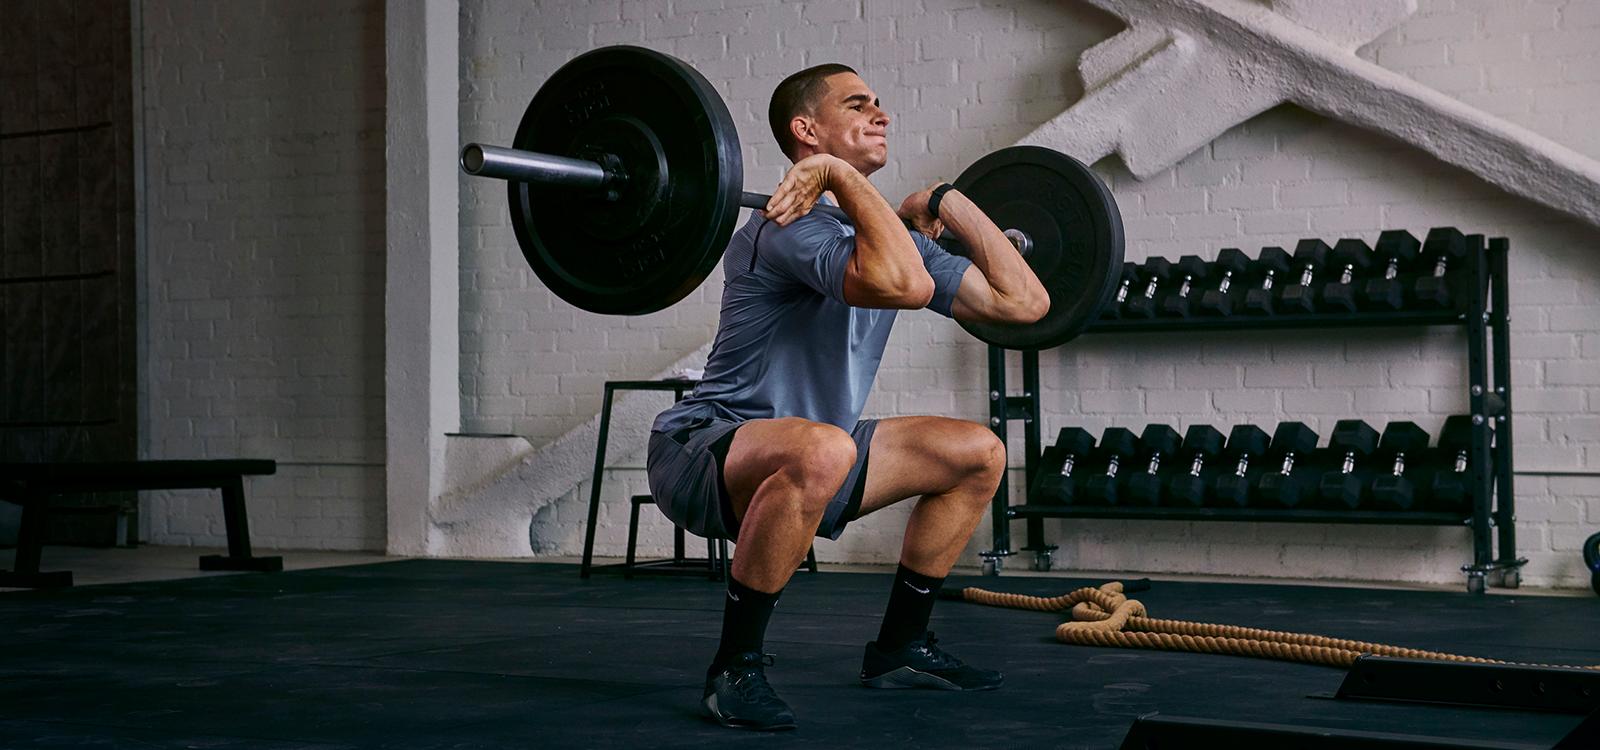 Men's Gym \u0026 Training Products | Nike HK